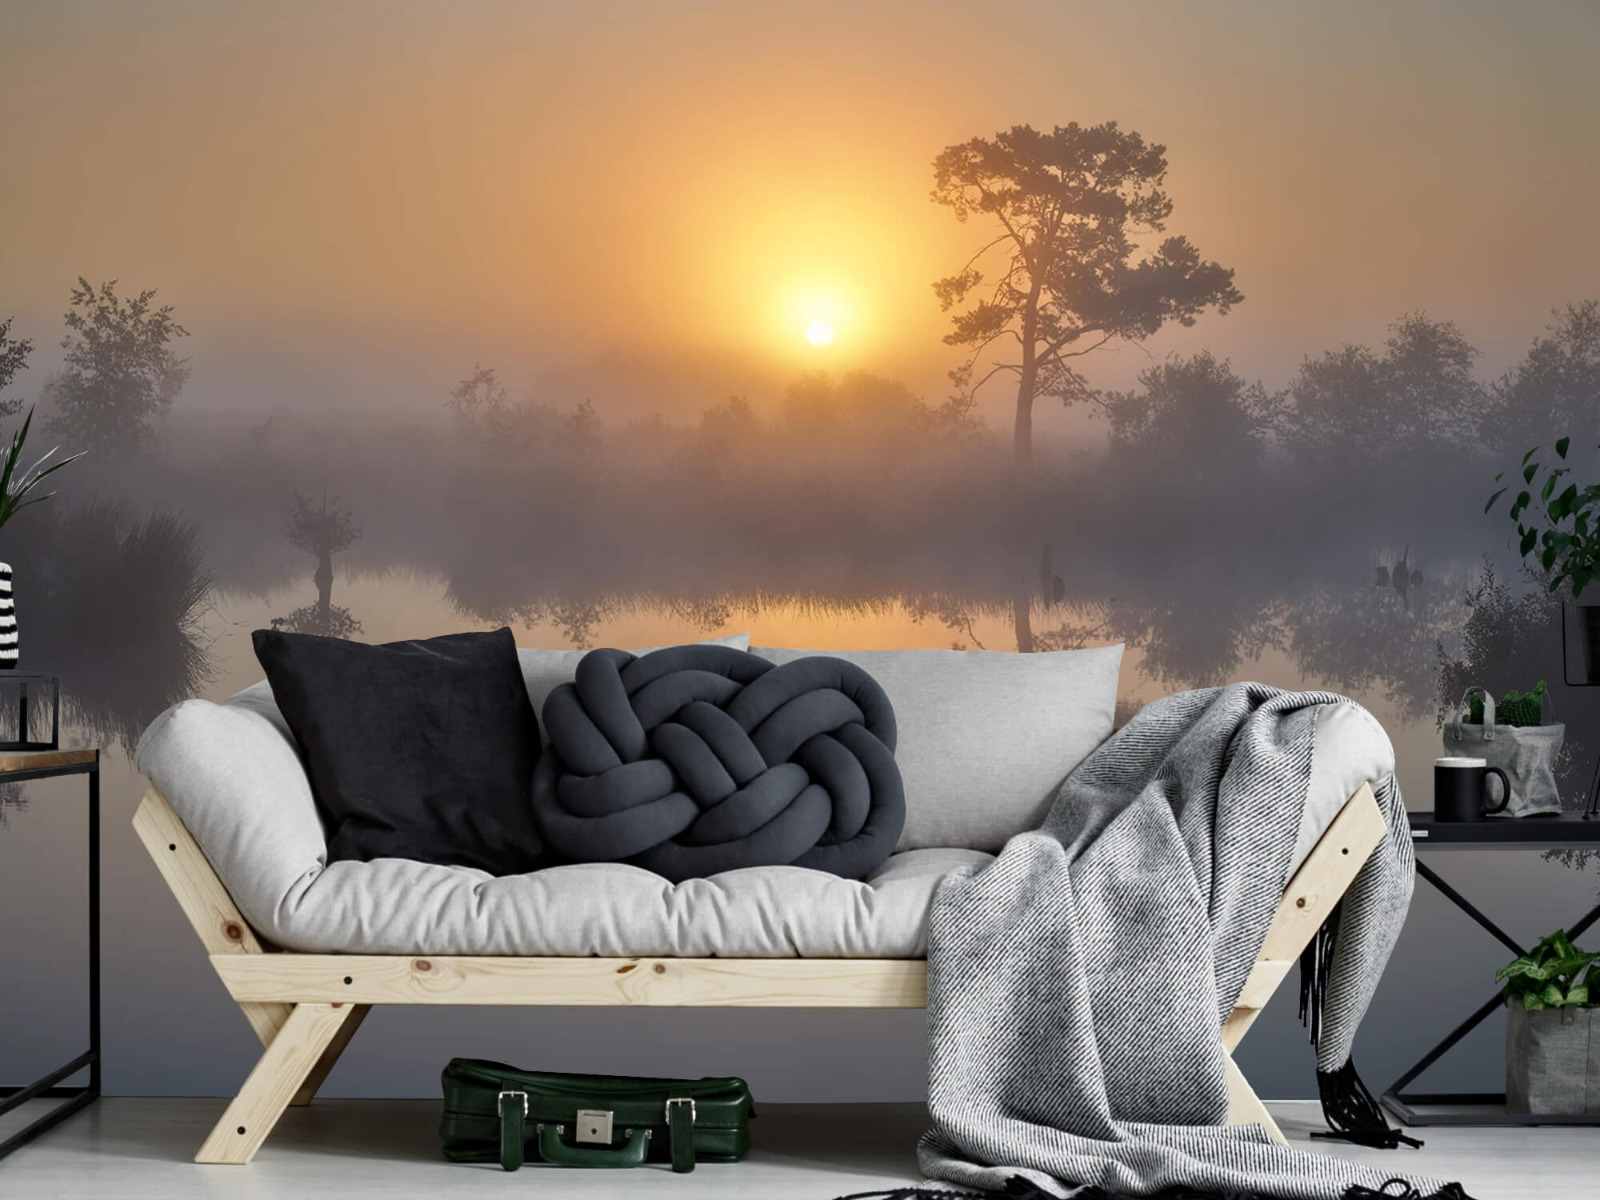 Natuur - Mistige zonsopkomst 8